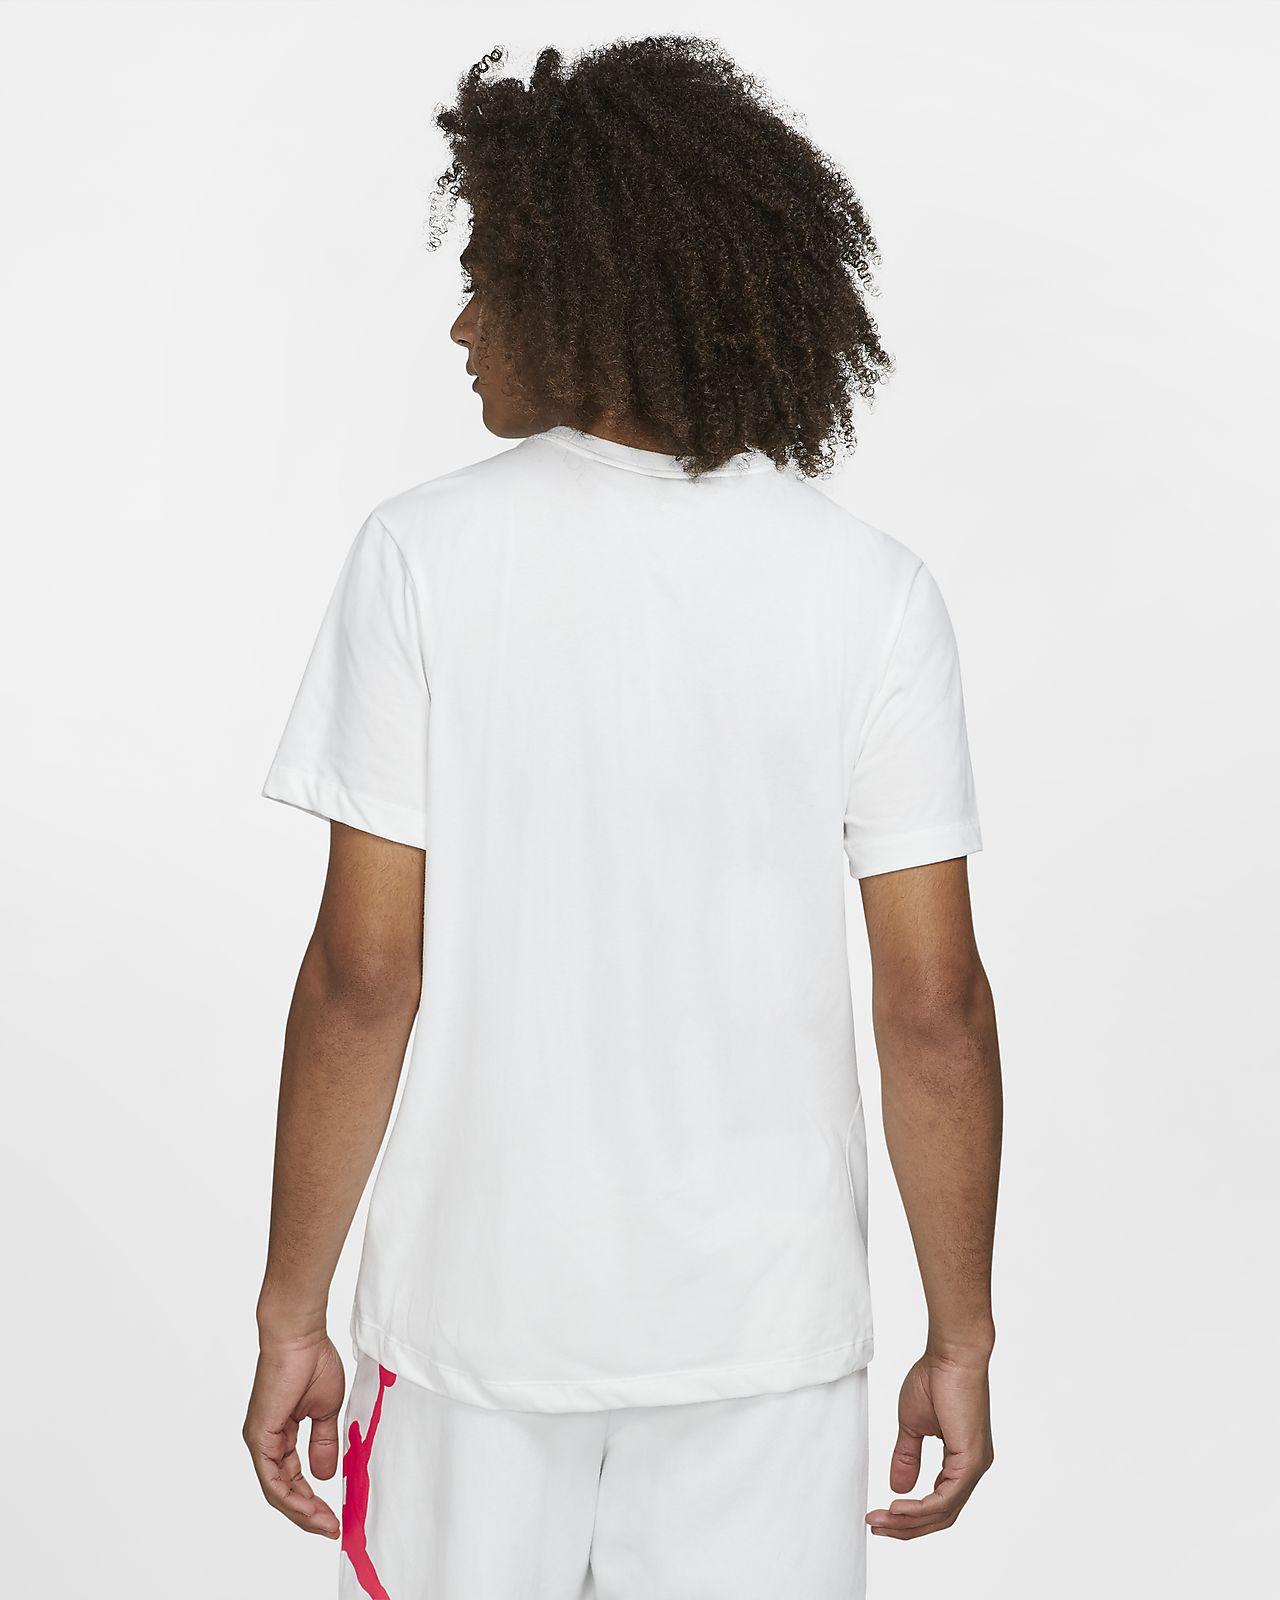 Jordan Fly Men's T Shirt